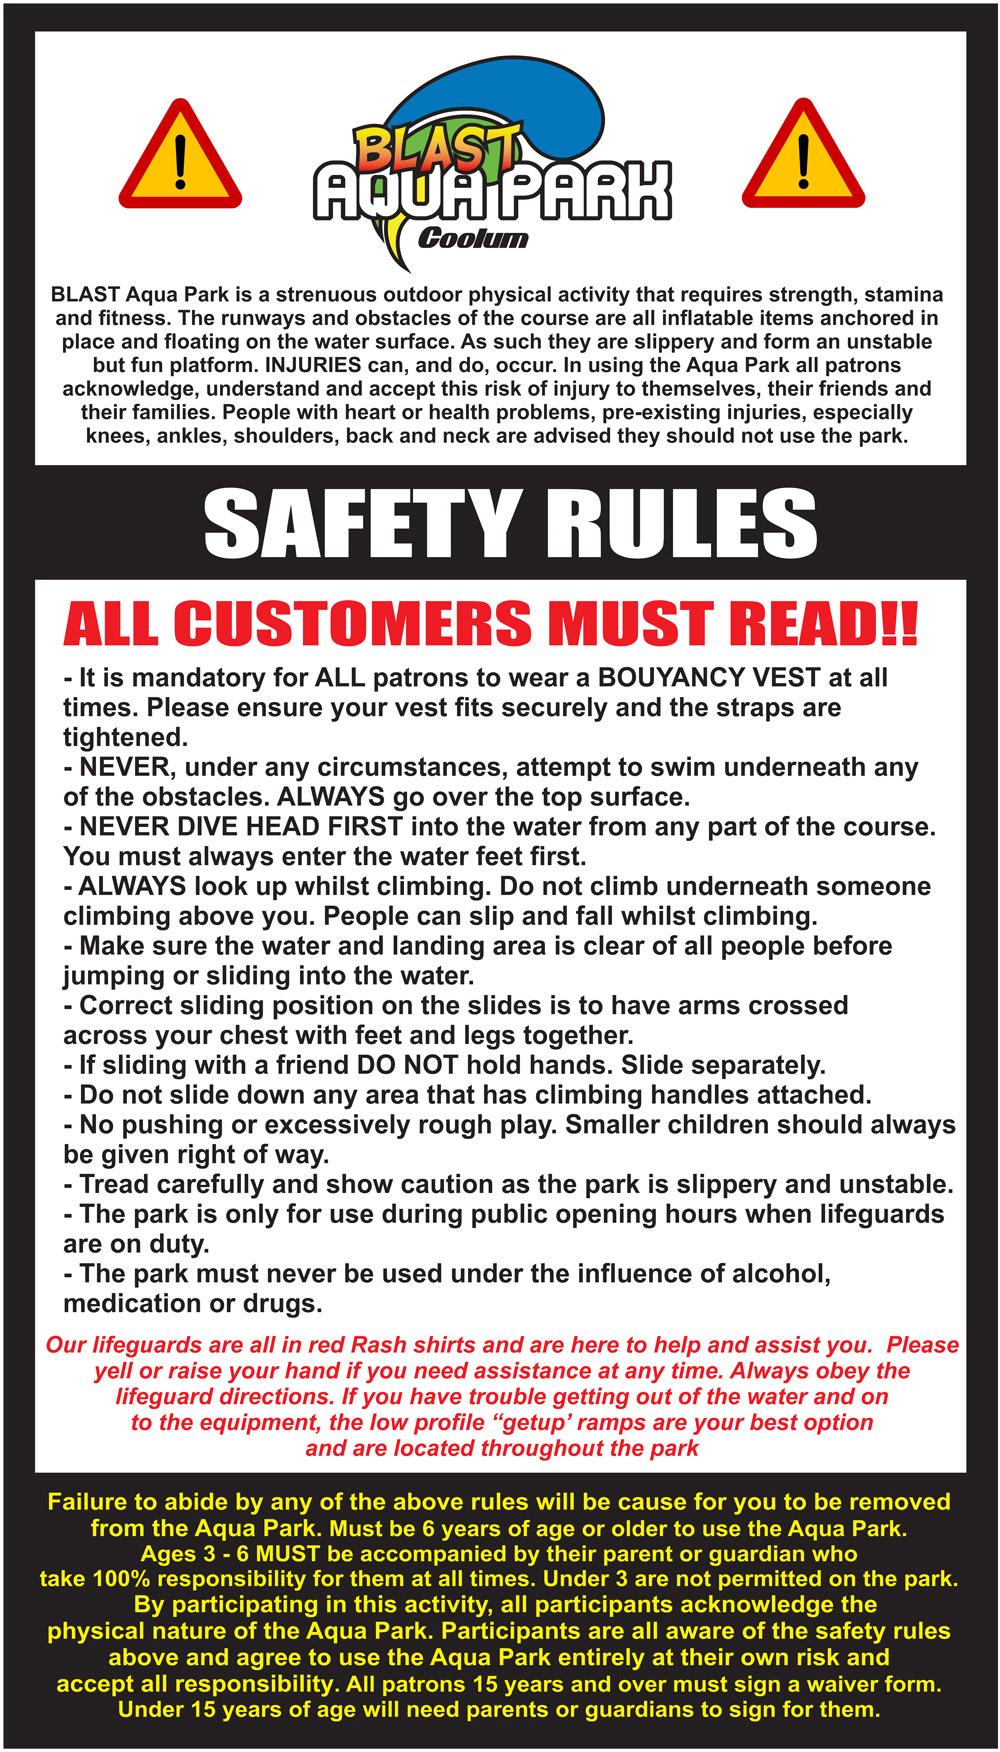 SafetyRules.jpg